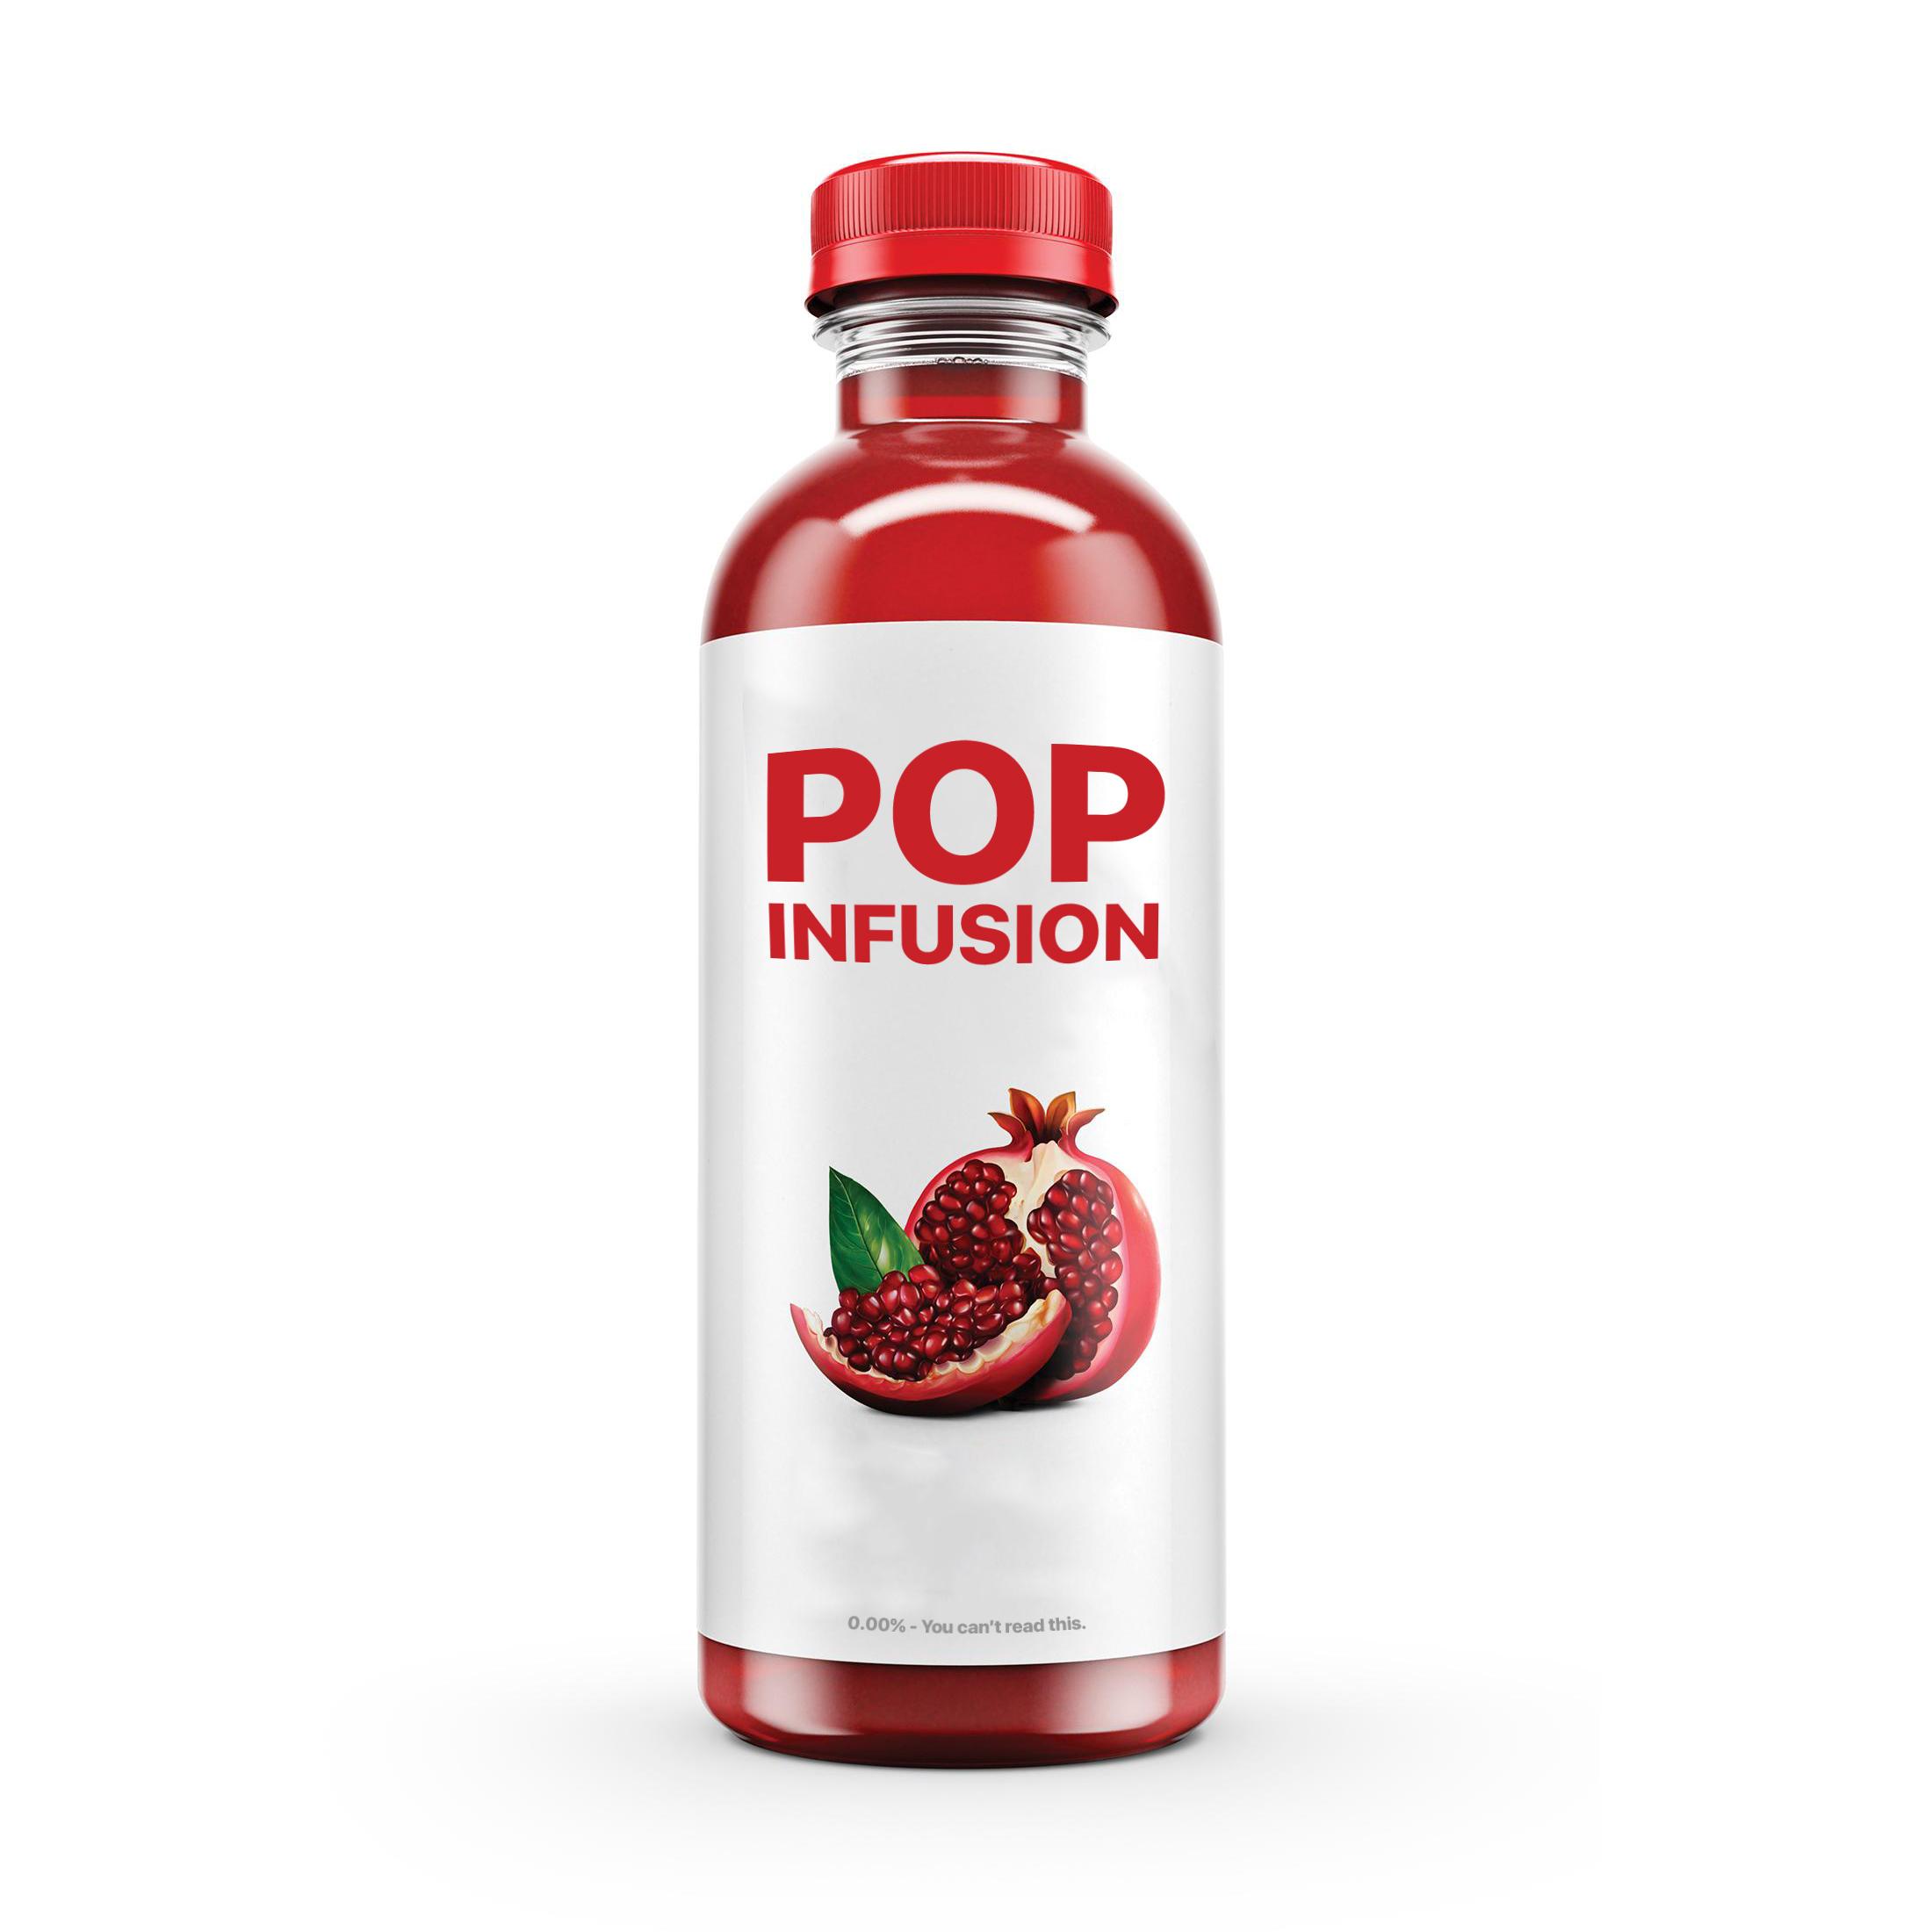 pop infusion art.jpg